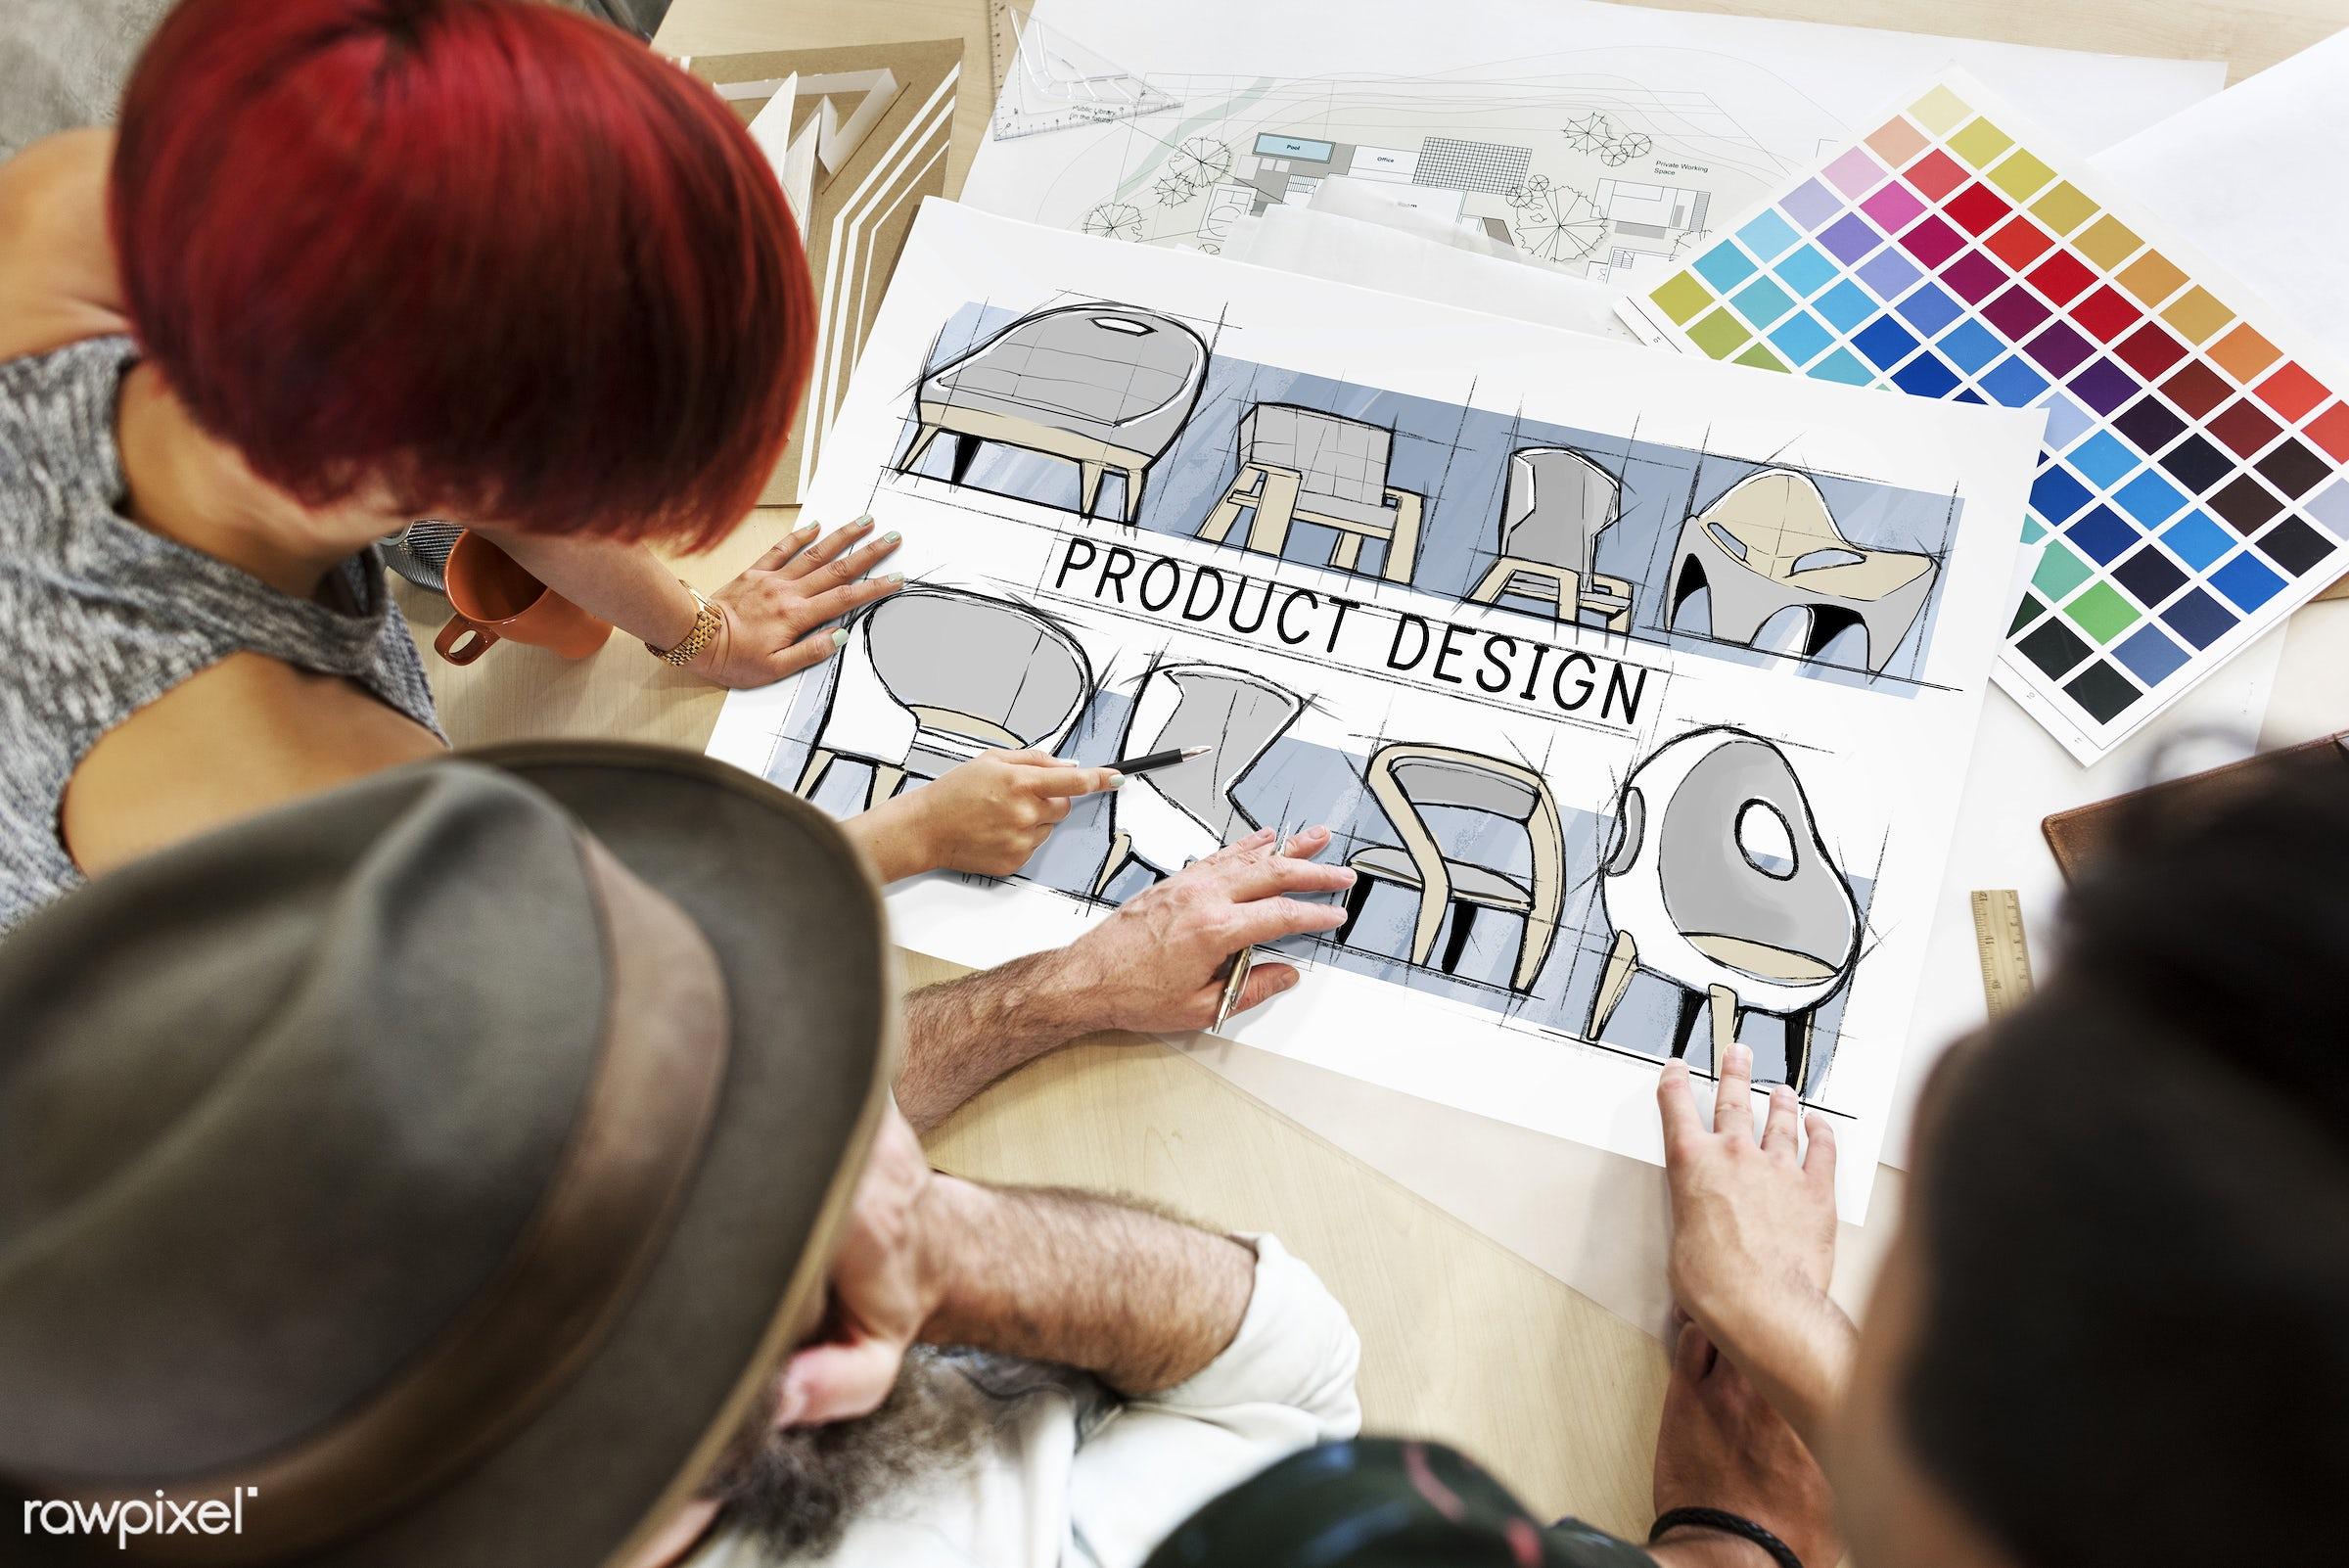 armchair, art, assemble, bench, chair, color chart, colors, comfort, contemporary, craft, craftsmanship, creation, design,...